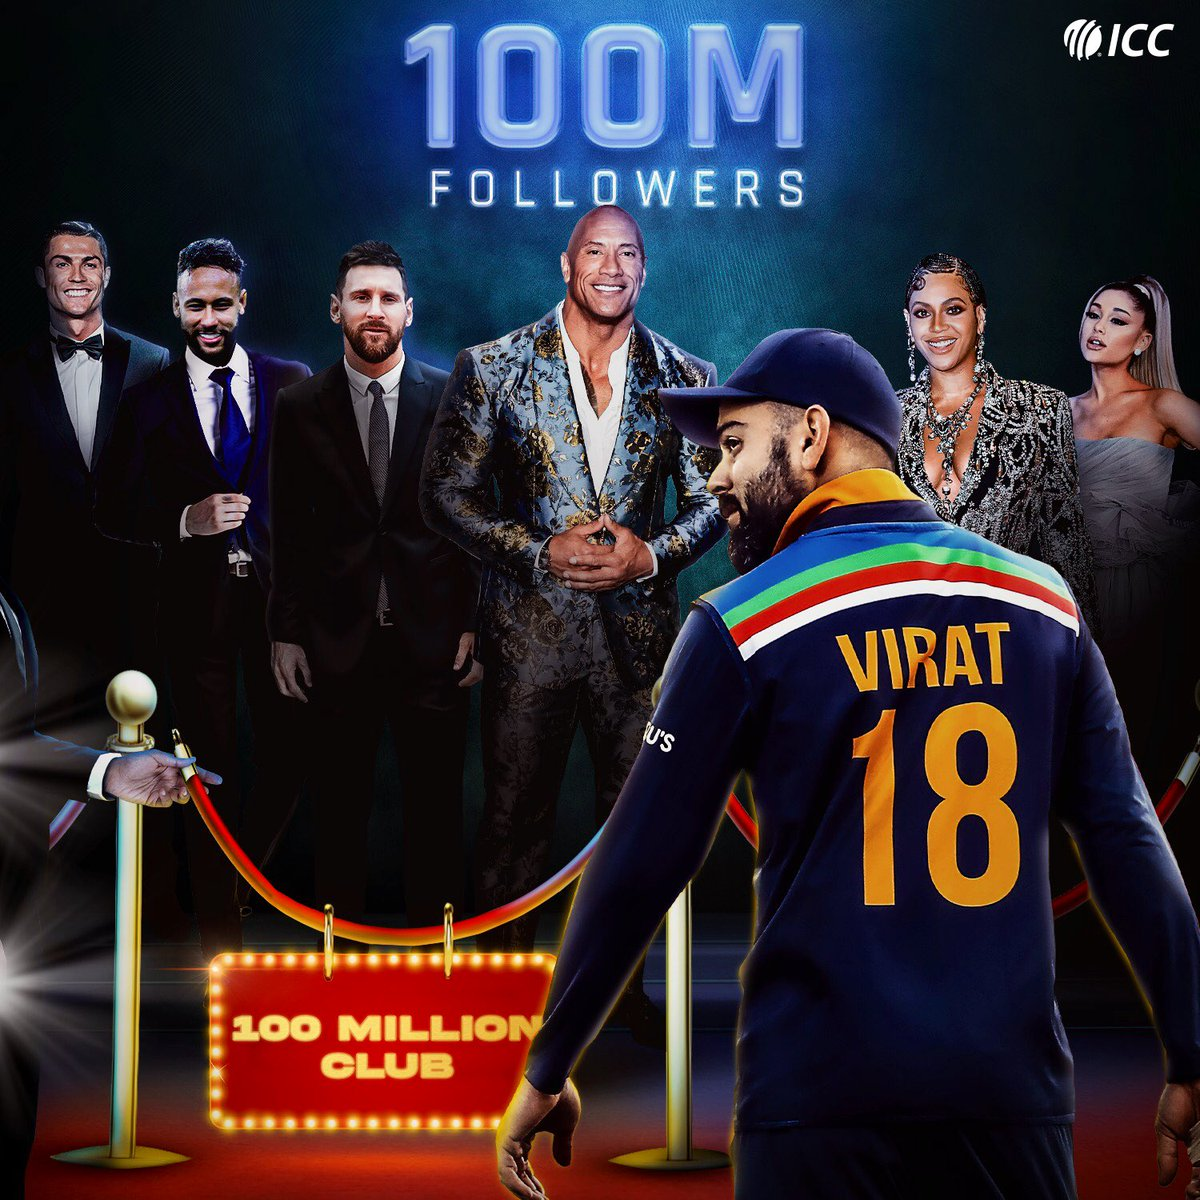 Virat Kohli - the first cricket star to hit 100 million followers on Instagram 🎉